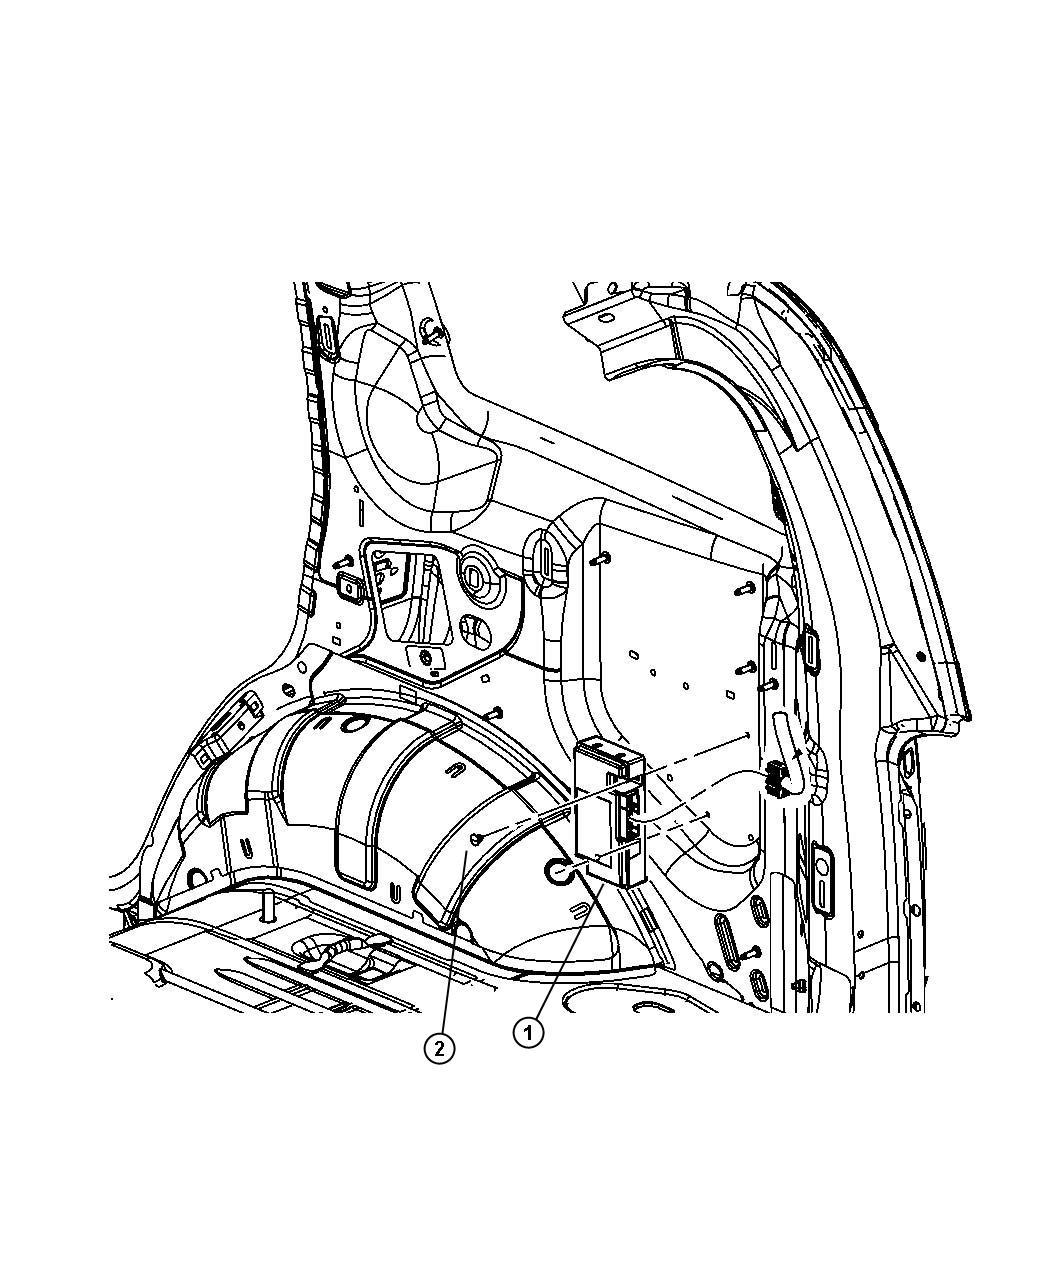 Chrysler Pt Cruiser Module Telematics With Attaching